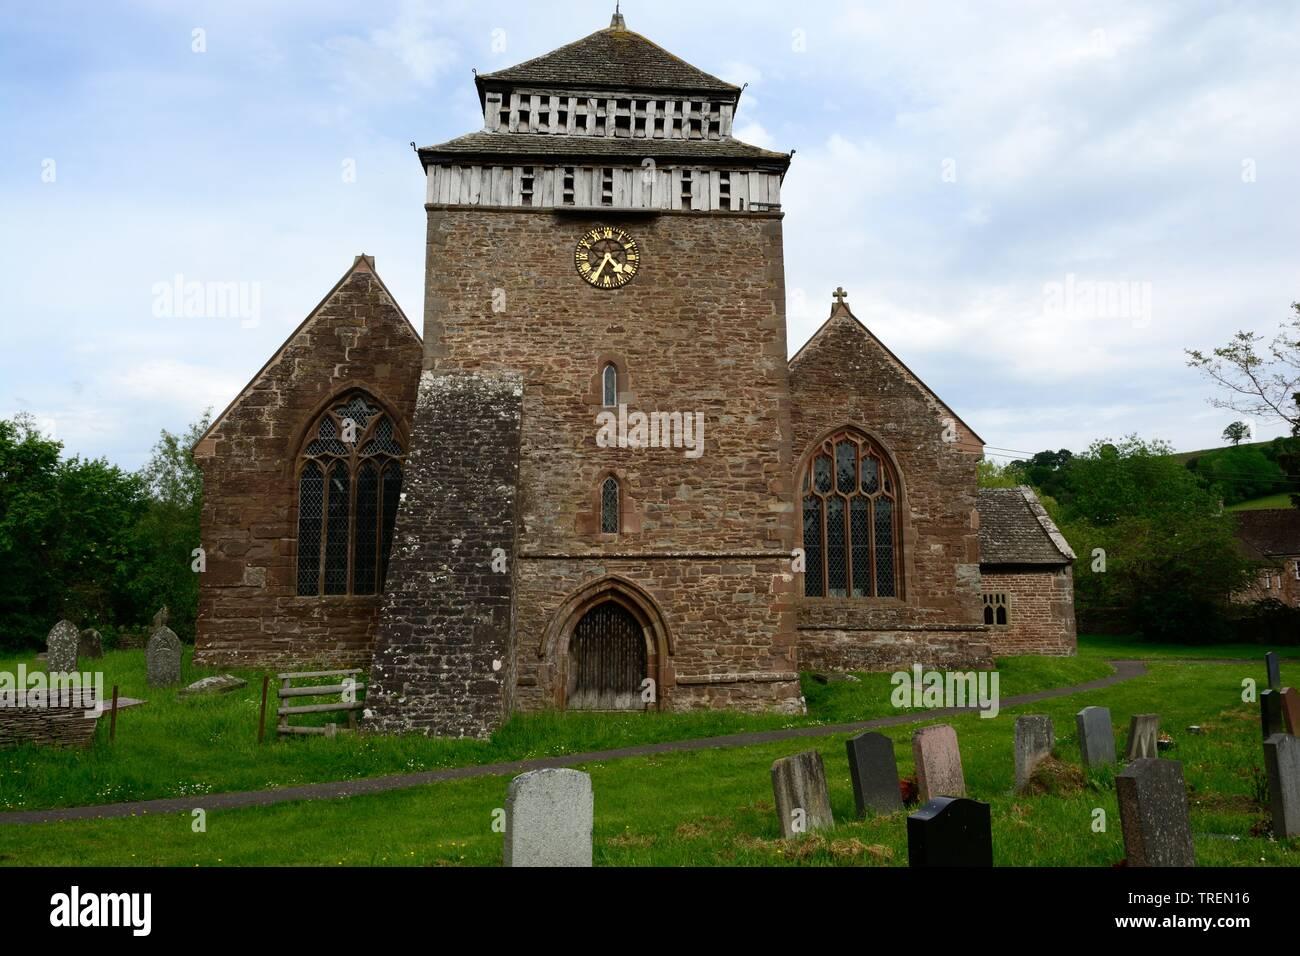 St Bridgets Church Skenfrith grade 1 listed building medieval origin Monmouthshire Wales cymru UK Stock Photo